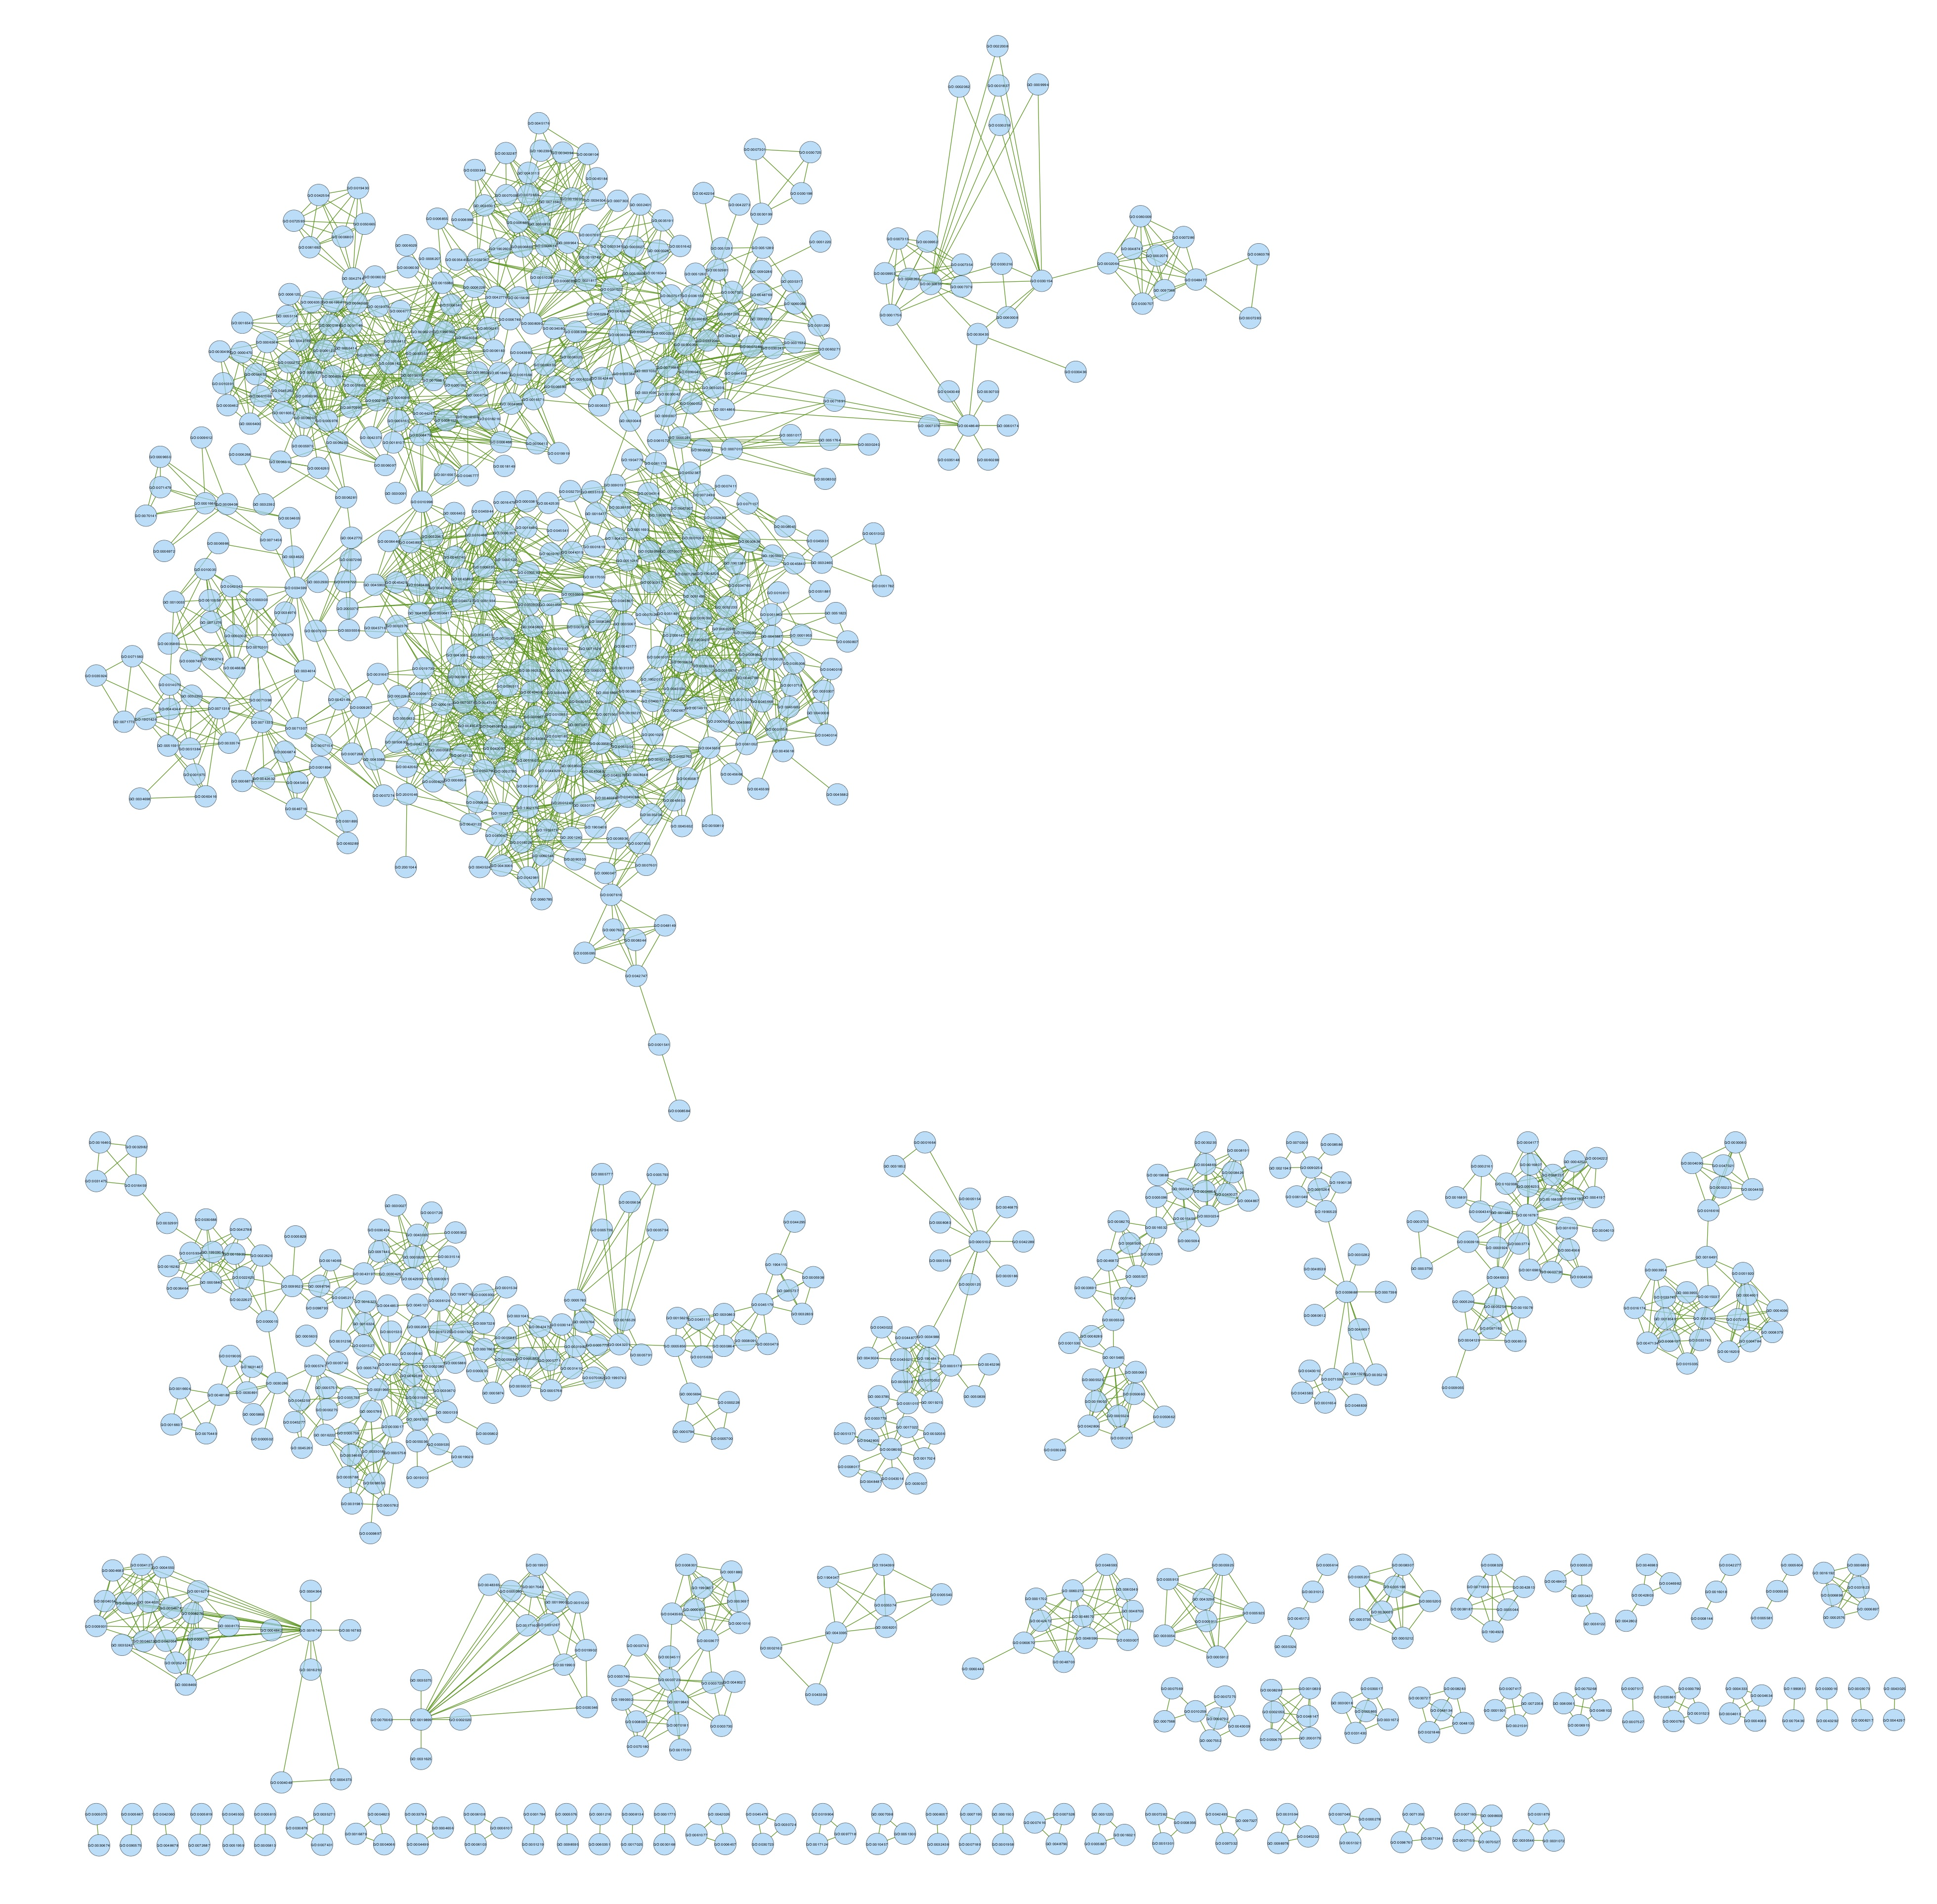 ASCA_GOterms_semsim_clusters.jpg